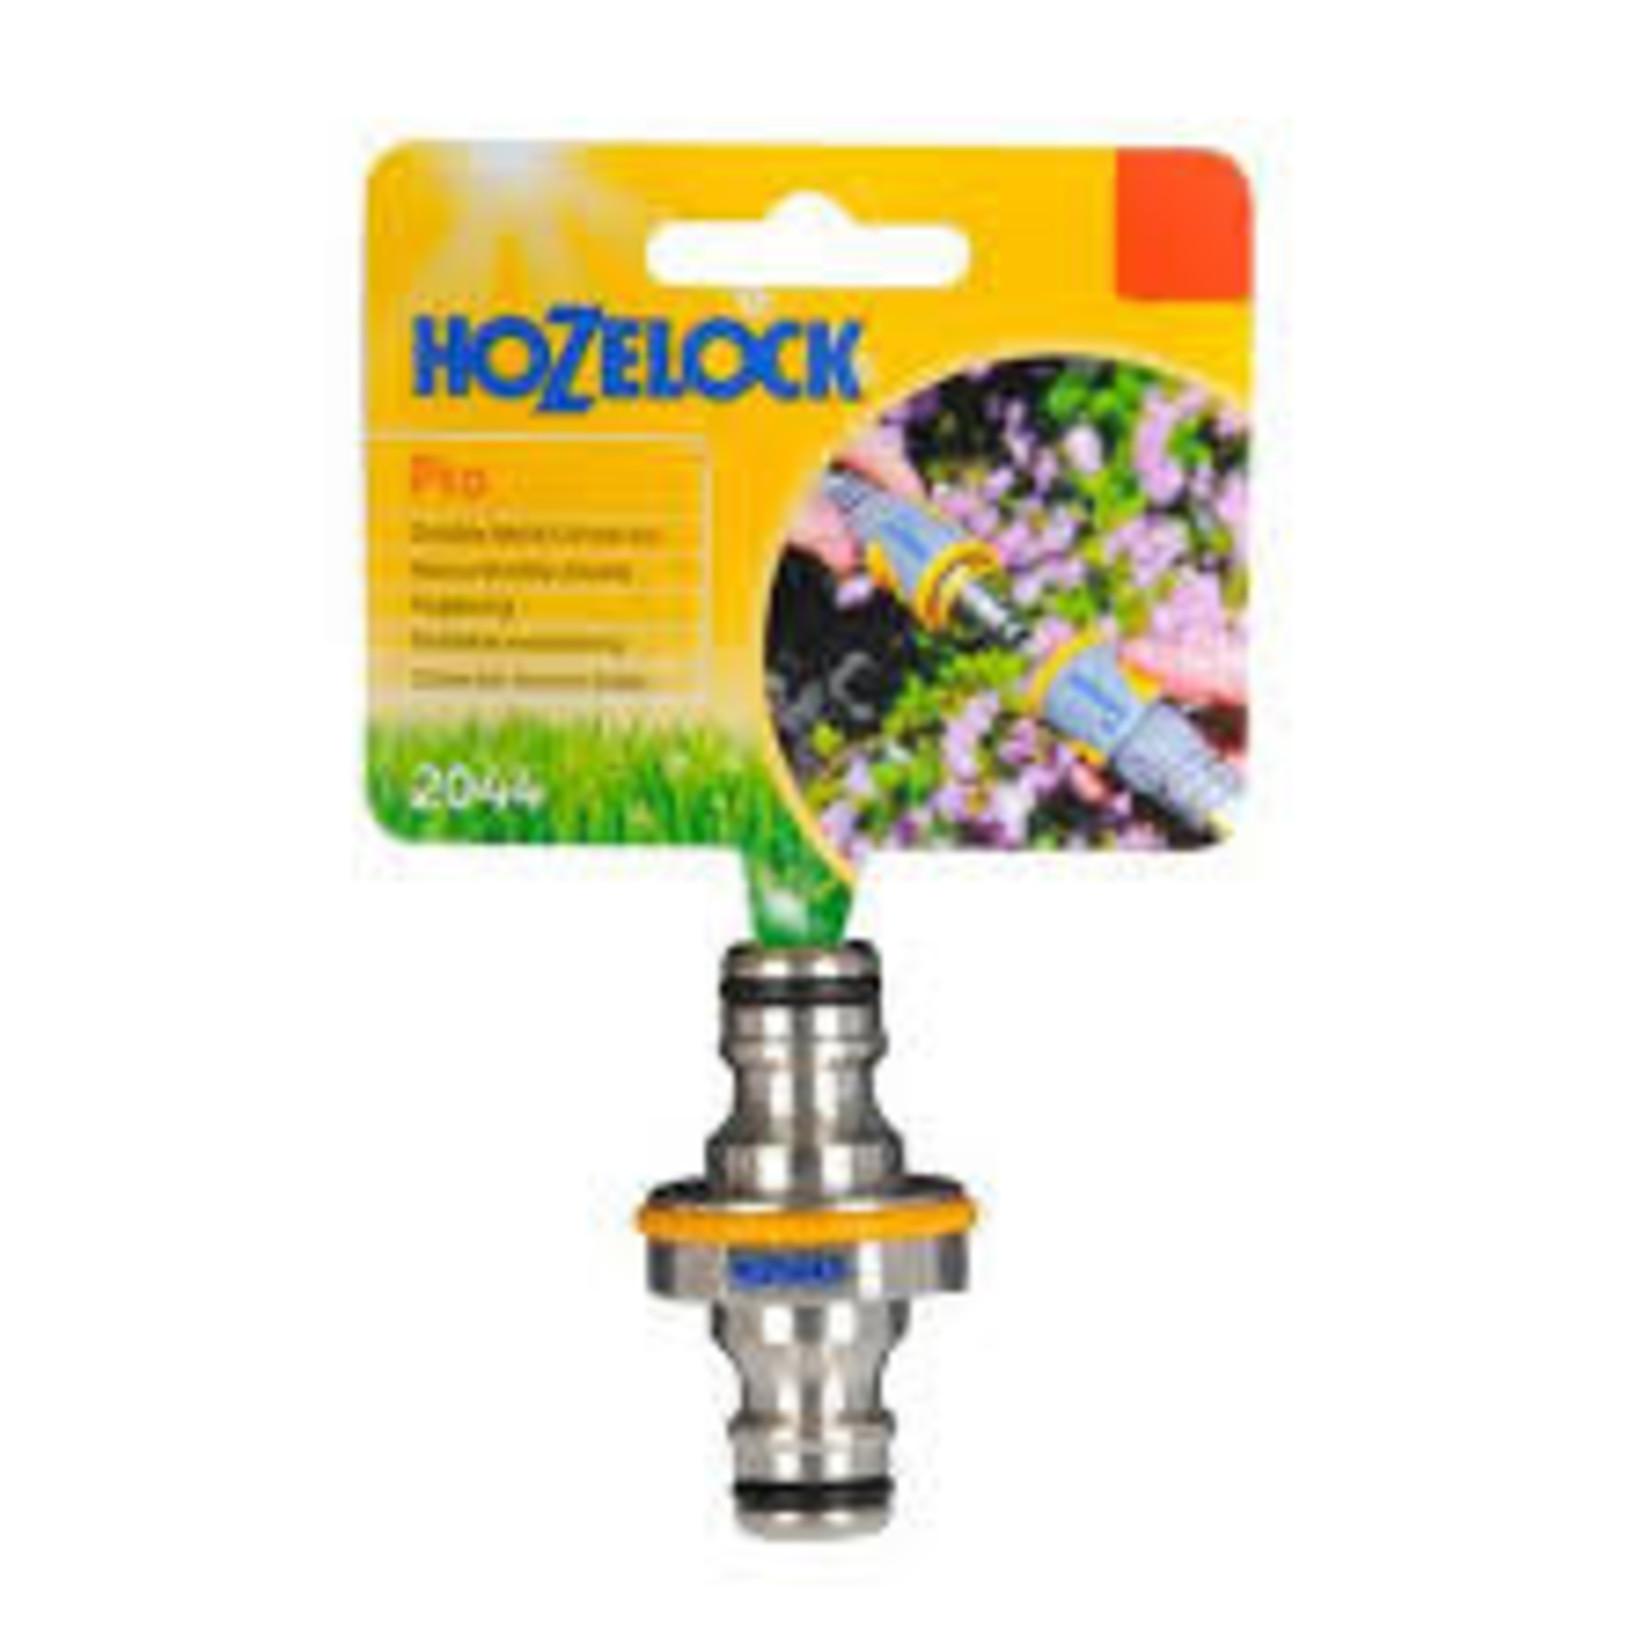 Hozelock 2044 HOZELOCK PRO DOUBLE MALE CONNECTOR METAL